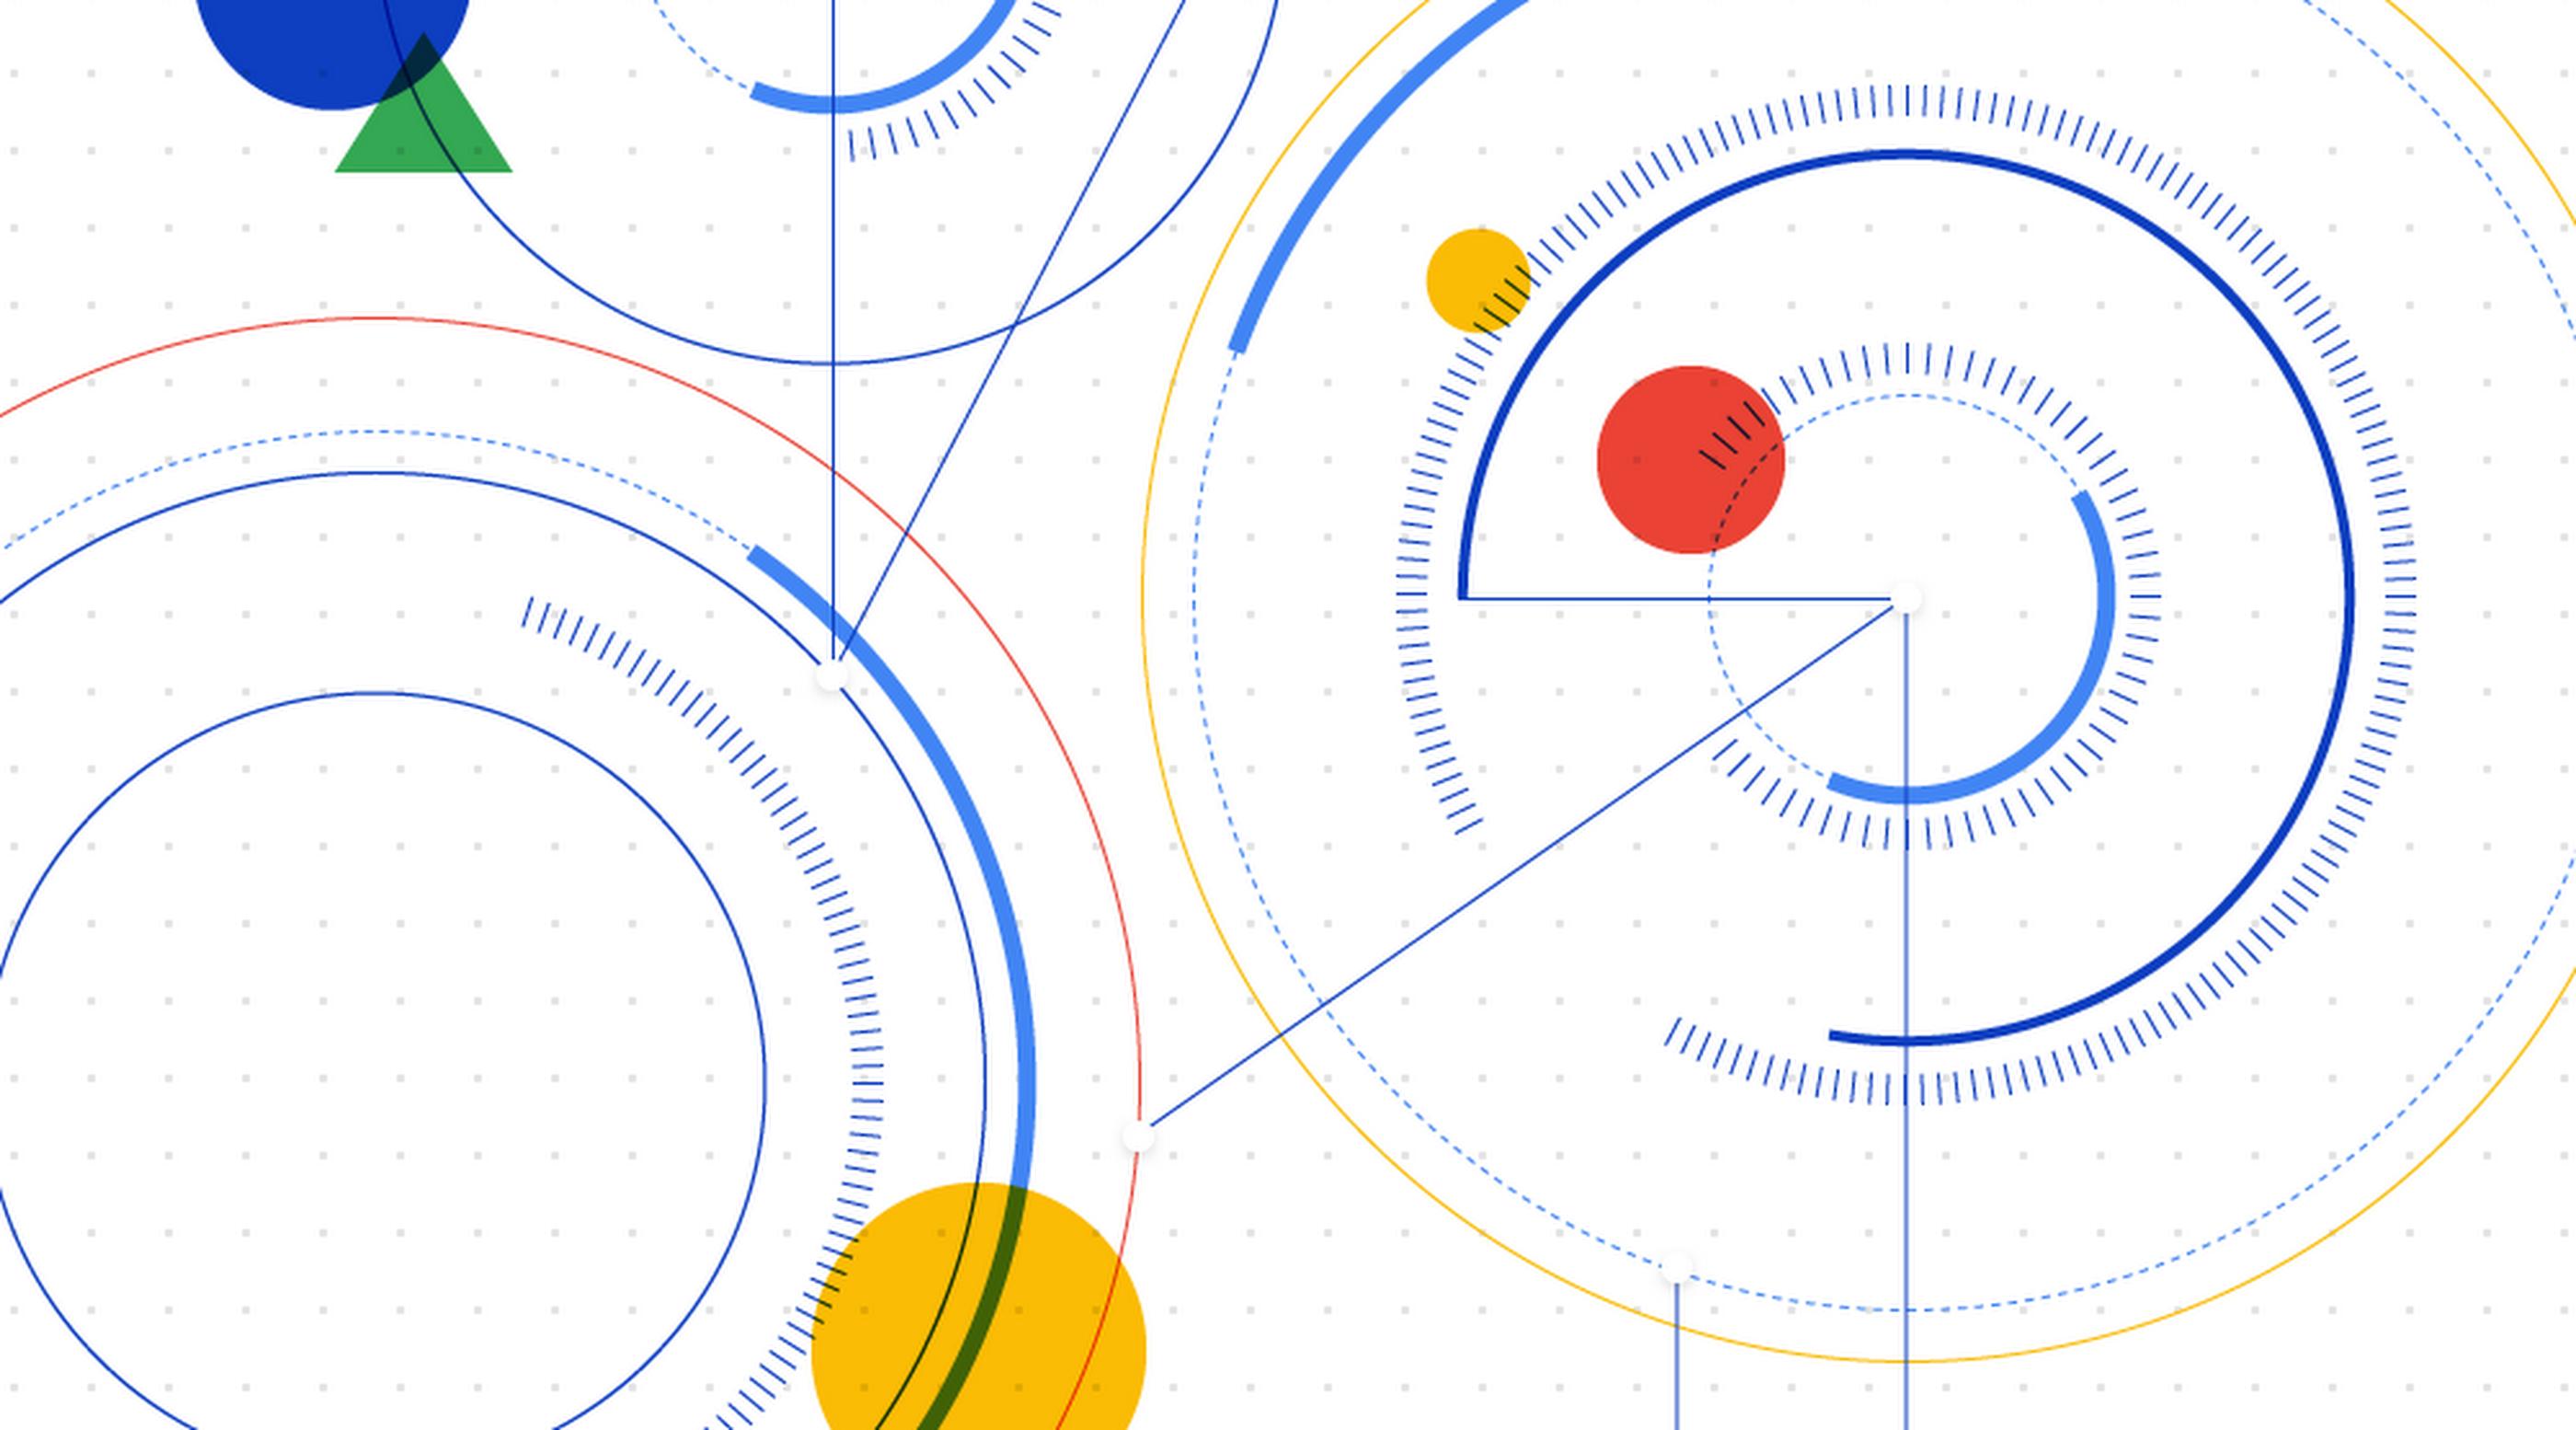 Google announces intent to acquire Velostrata | Official Google Blog